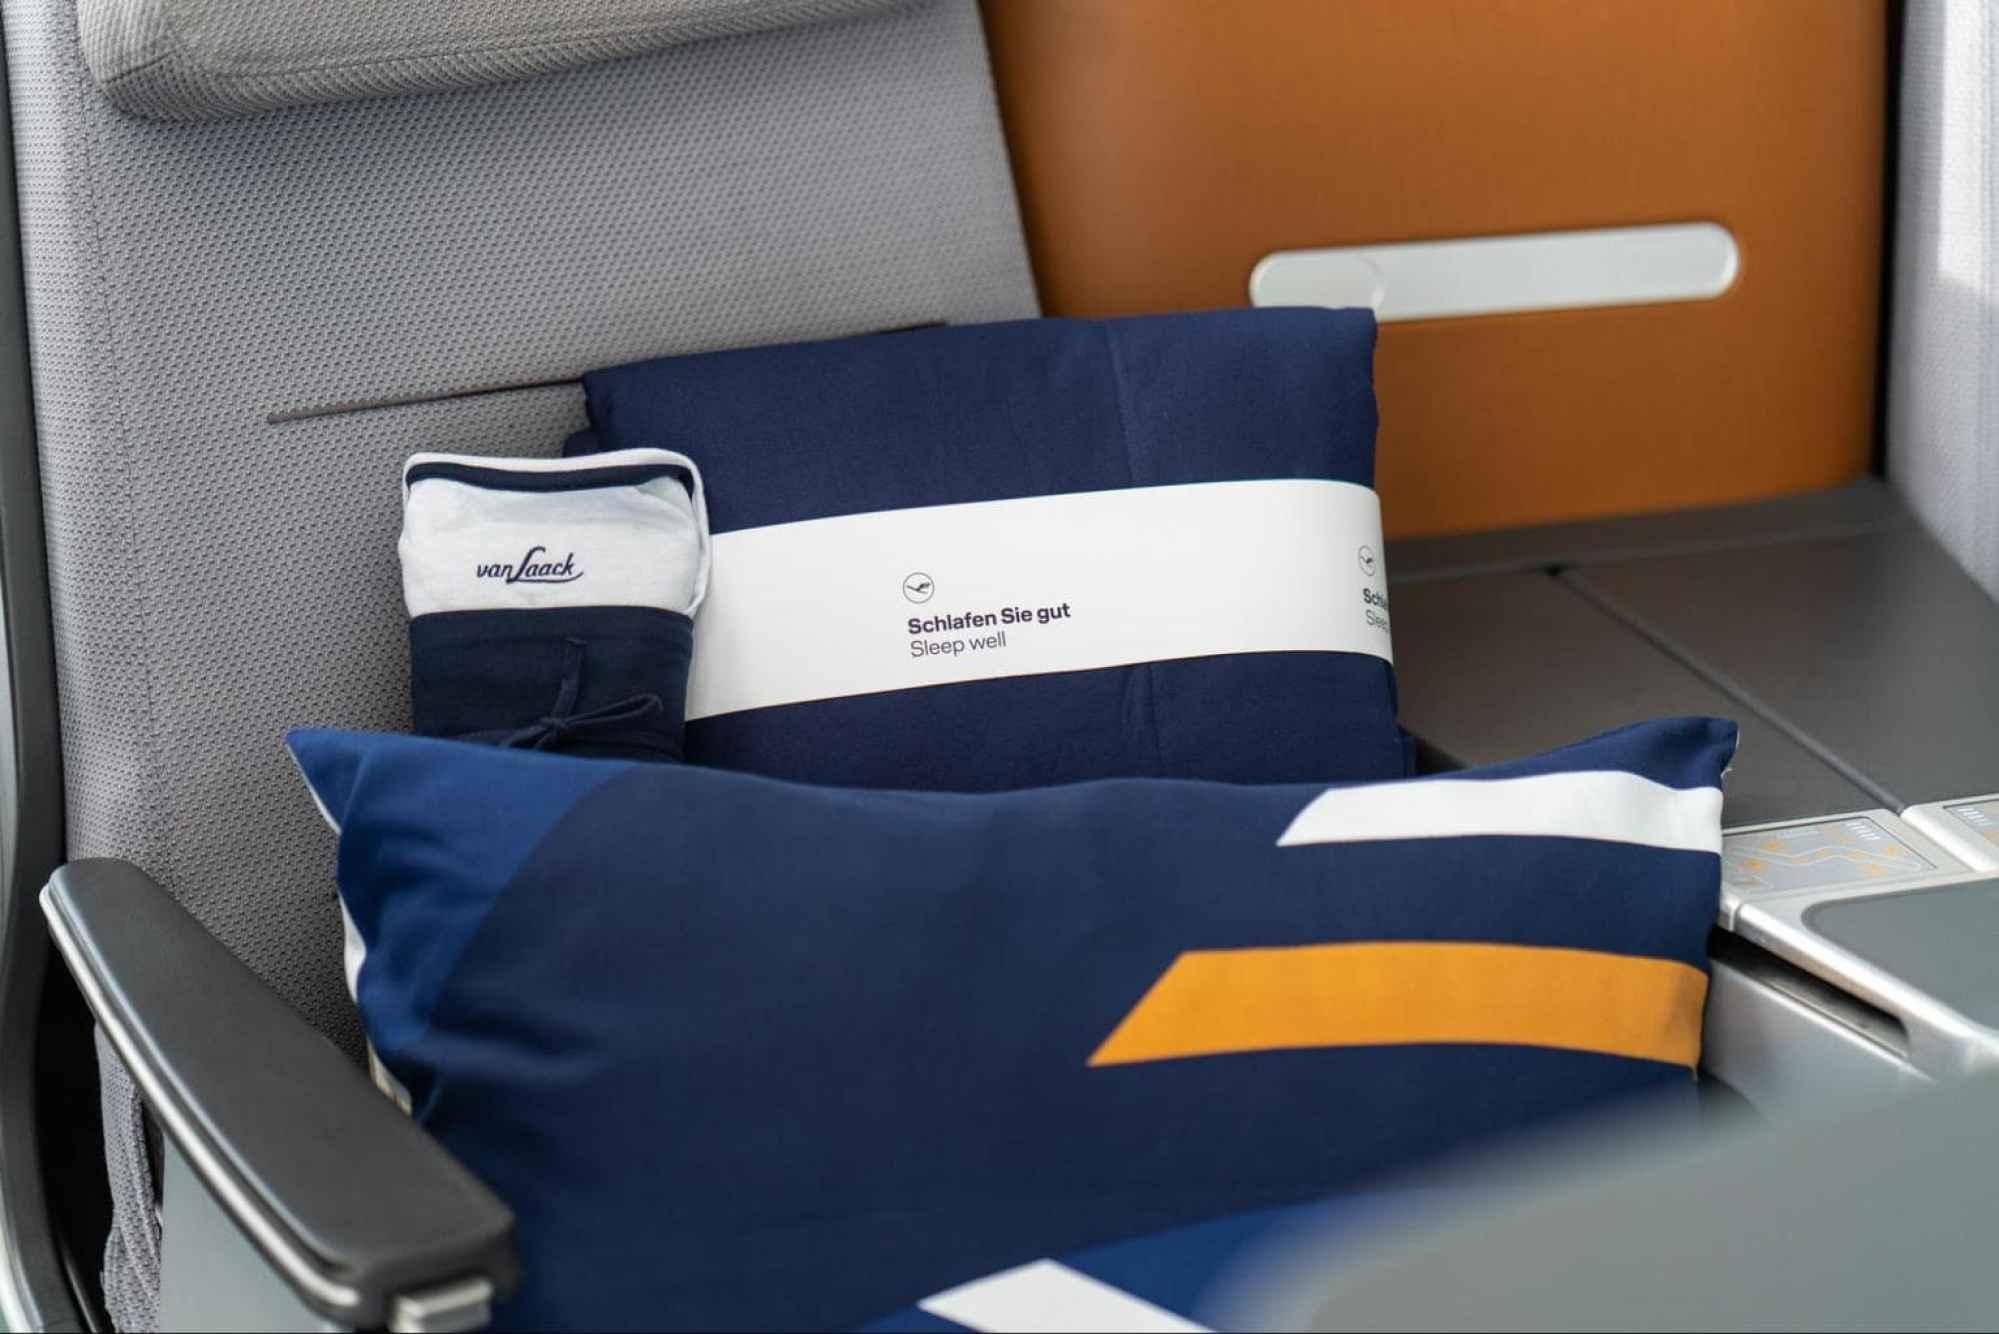 Lufthansa Dream Collection pillow, duvet and pyjamas